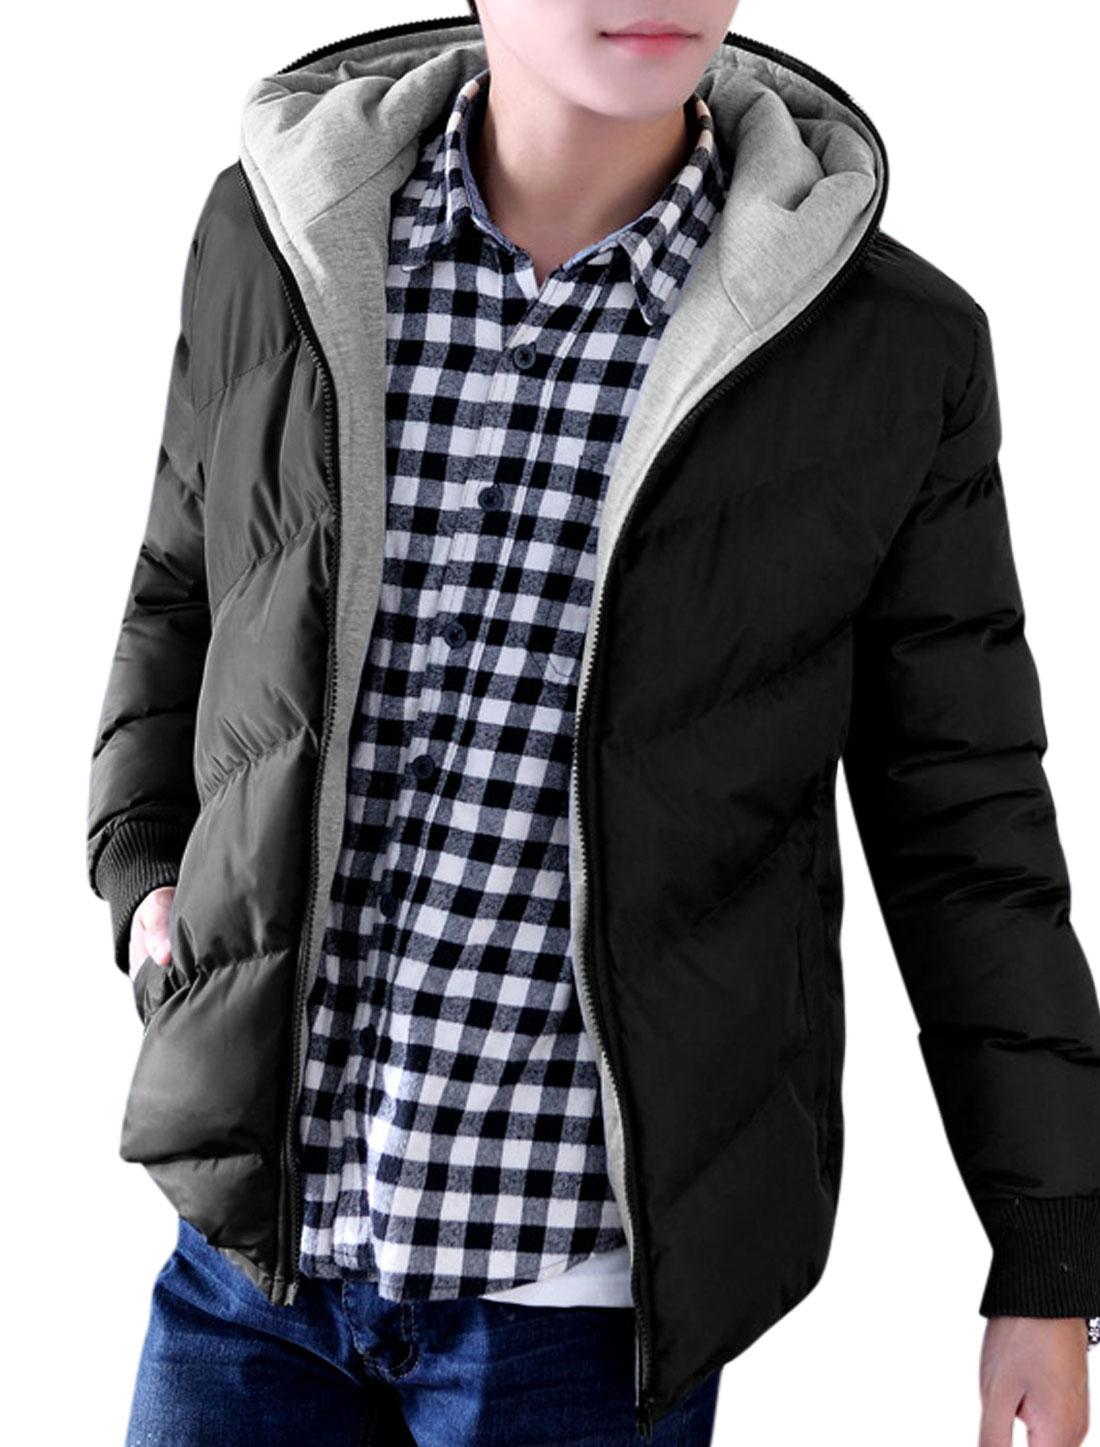 Men Hooded Long Sleeves Zip Closure Ribbed Trim Casual Padded Coat Black Gray M